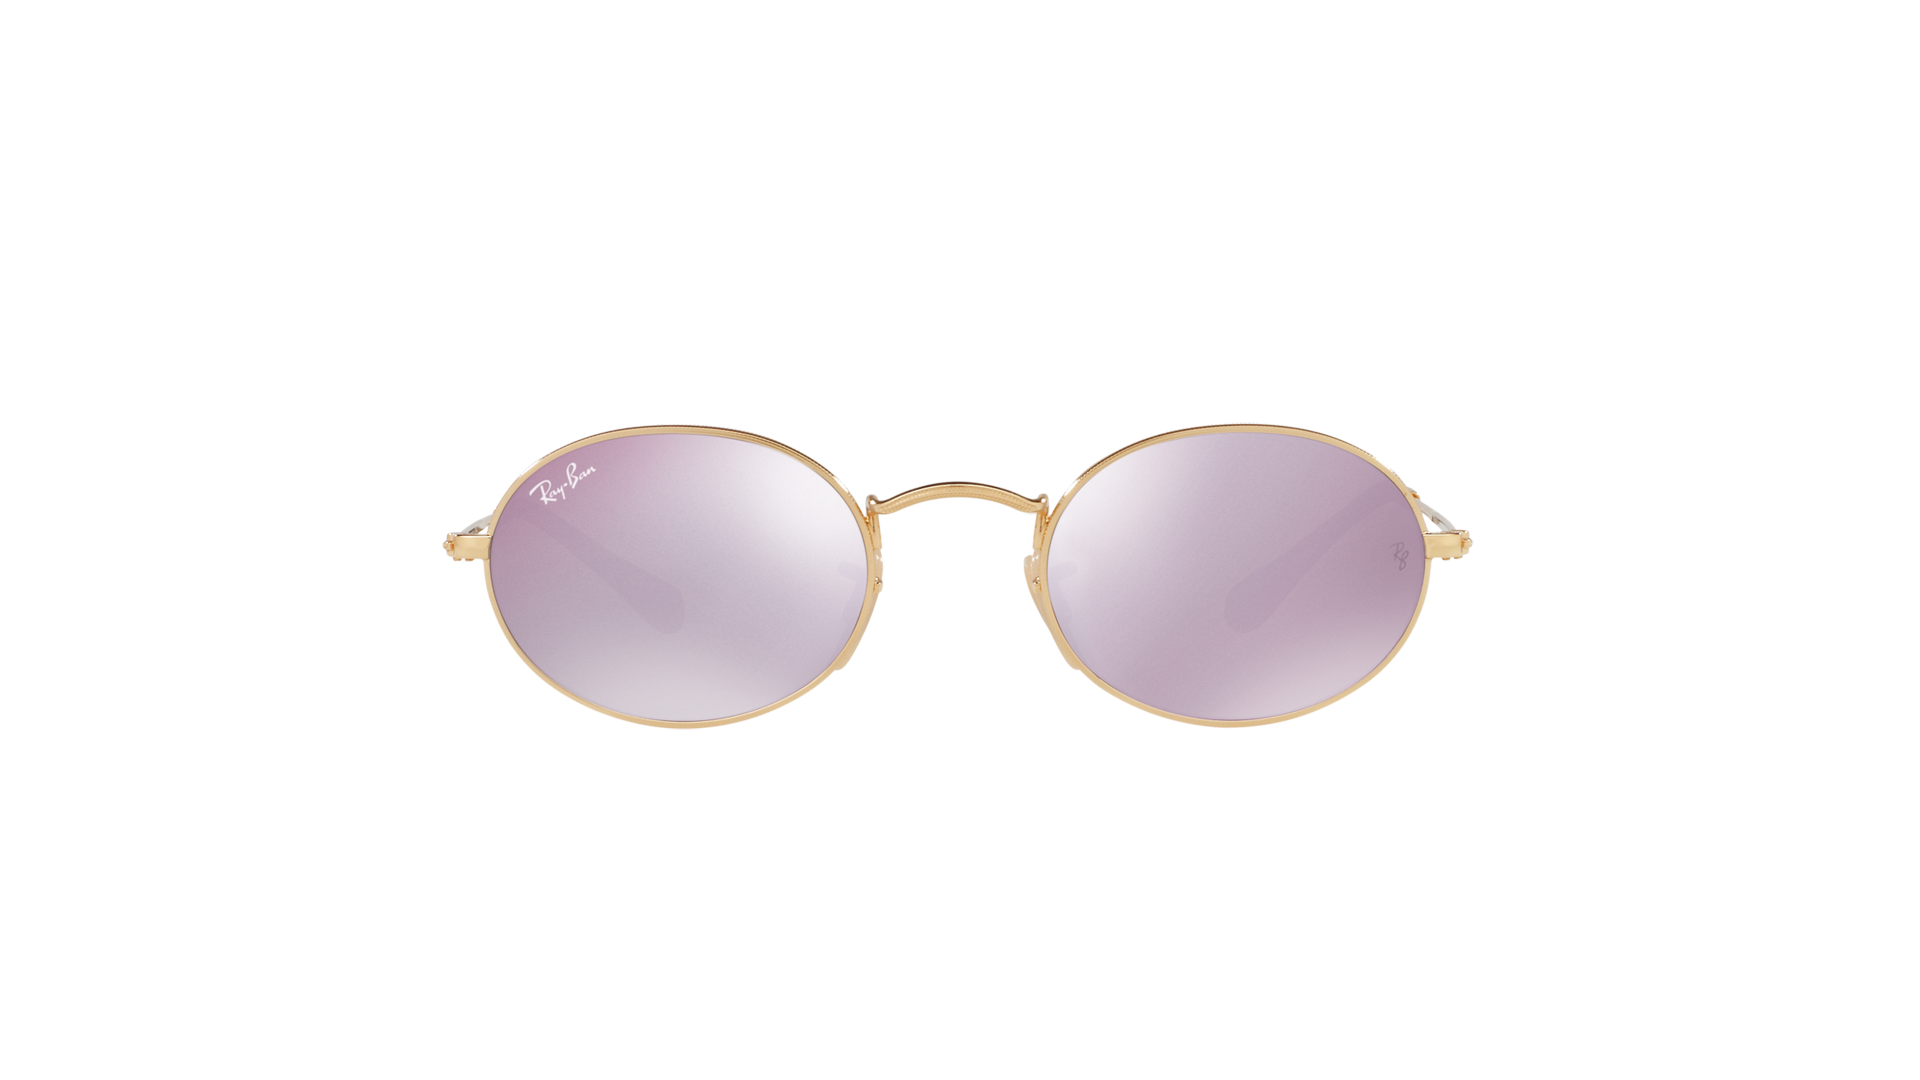 b42adf3527 Sunglasses Ray-Ban Oval Flat Lenses Gold RB3547N 001 8O 51-21 Medium Mirror